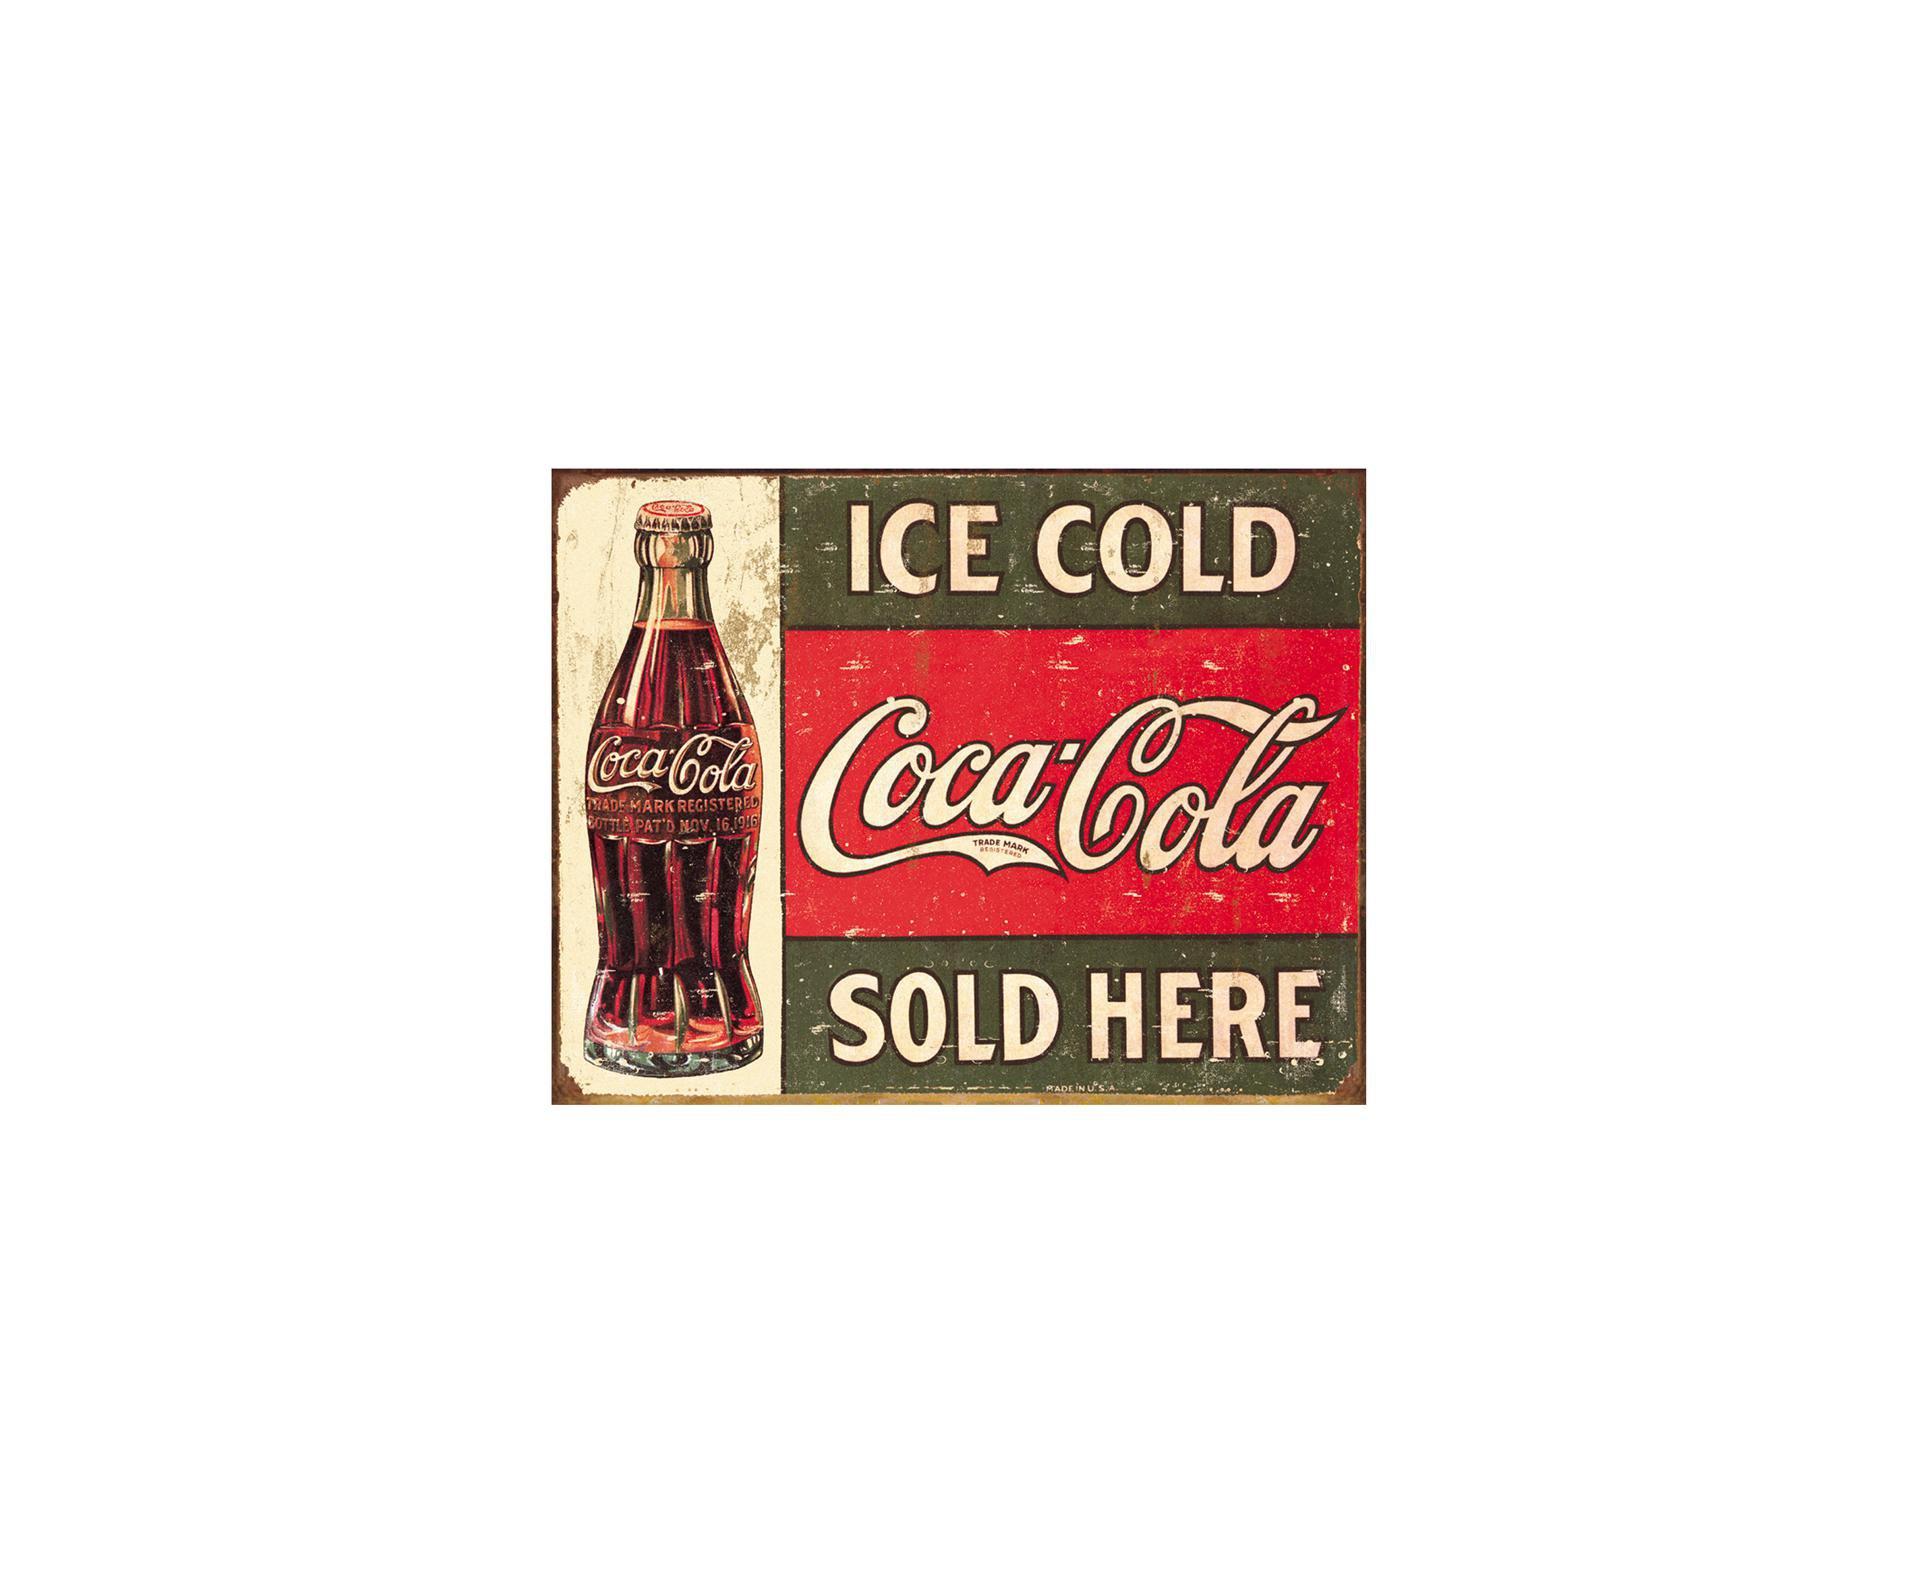 Placa Metálica Decorativa Ice Cold Coke 2 - Rossi